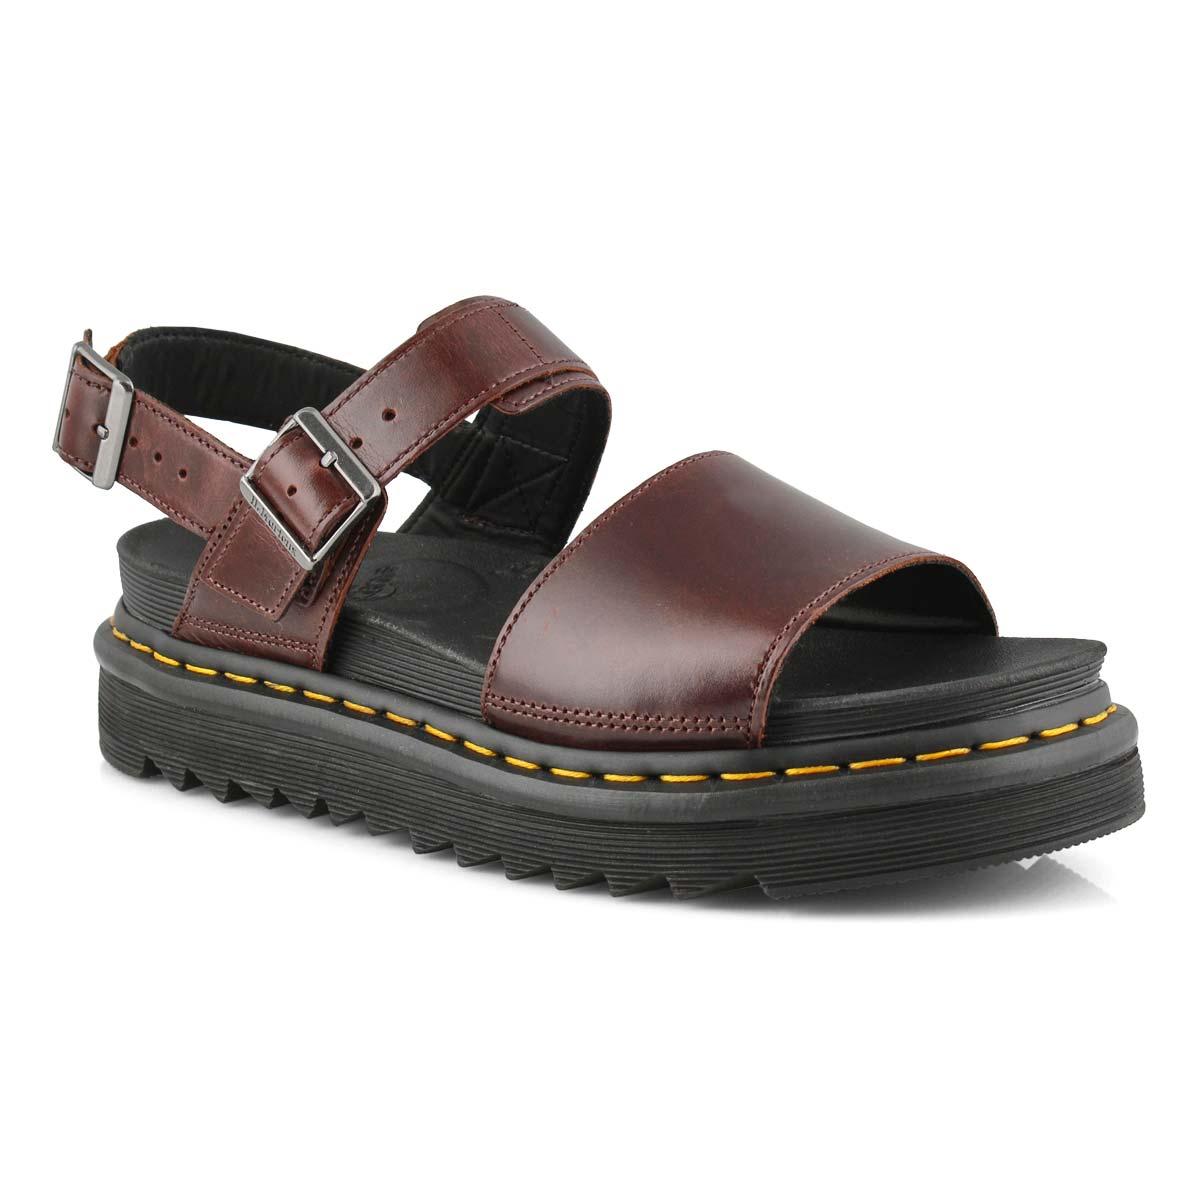 Lds Voss charro 2 strap casual sandal